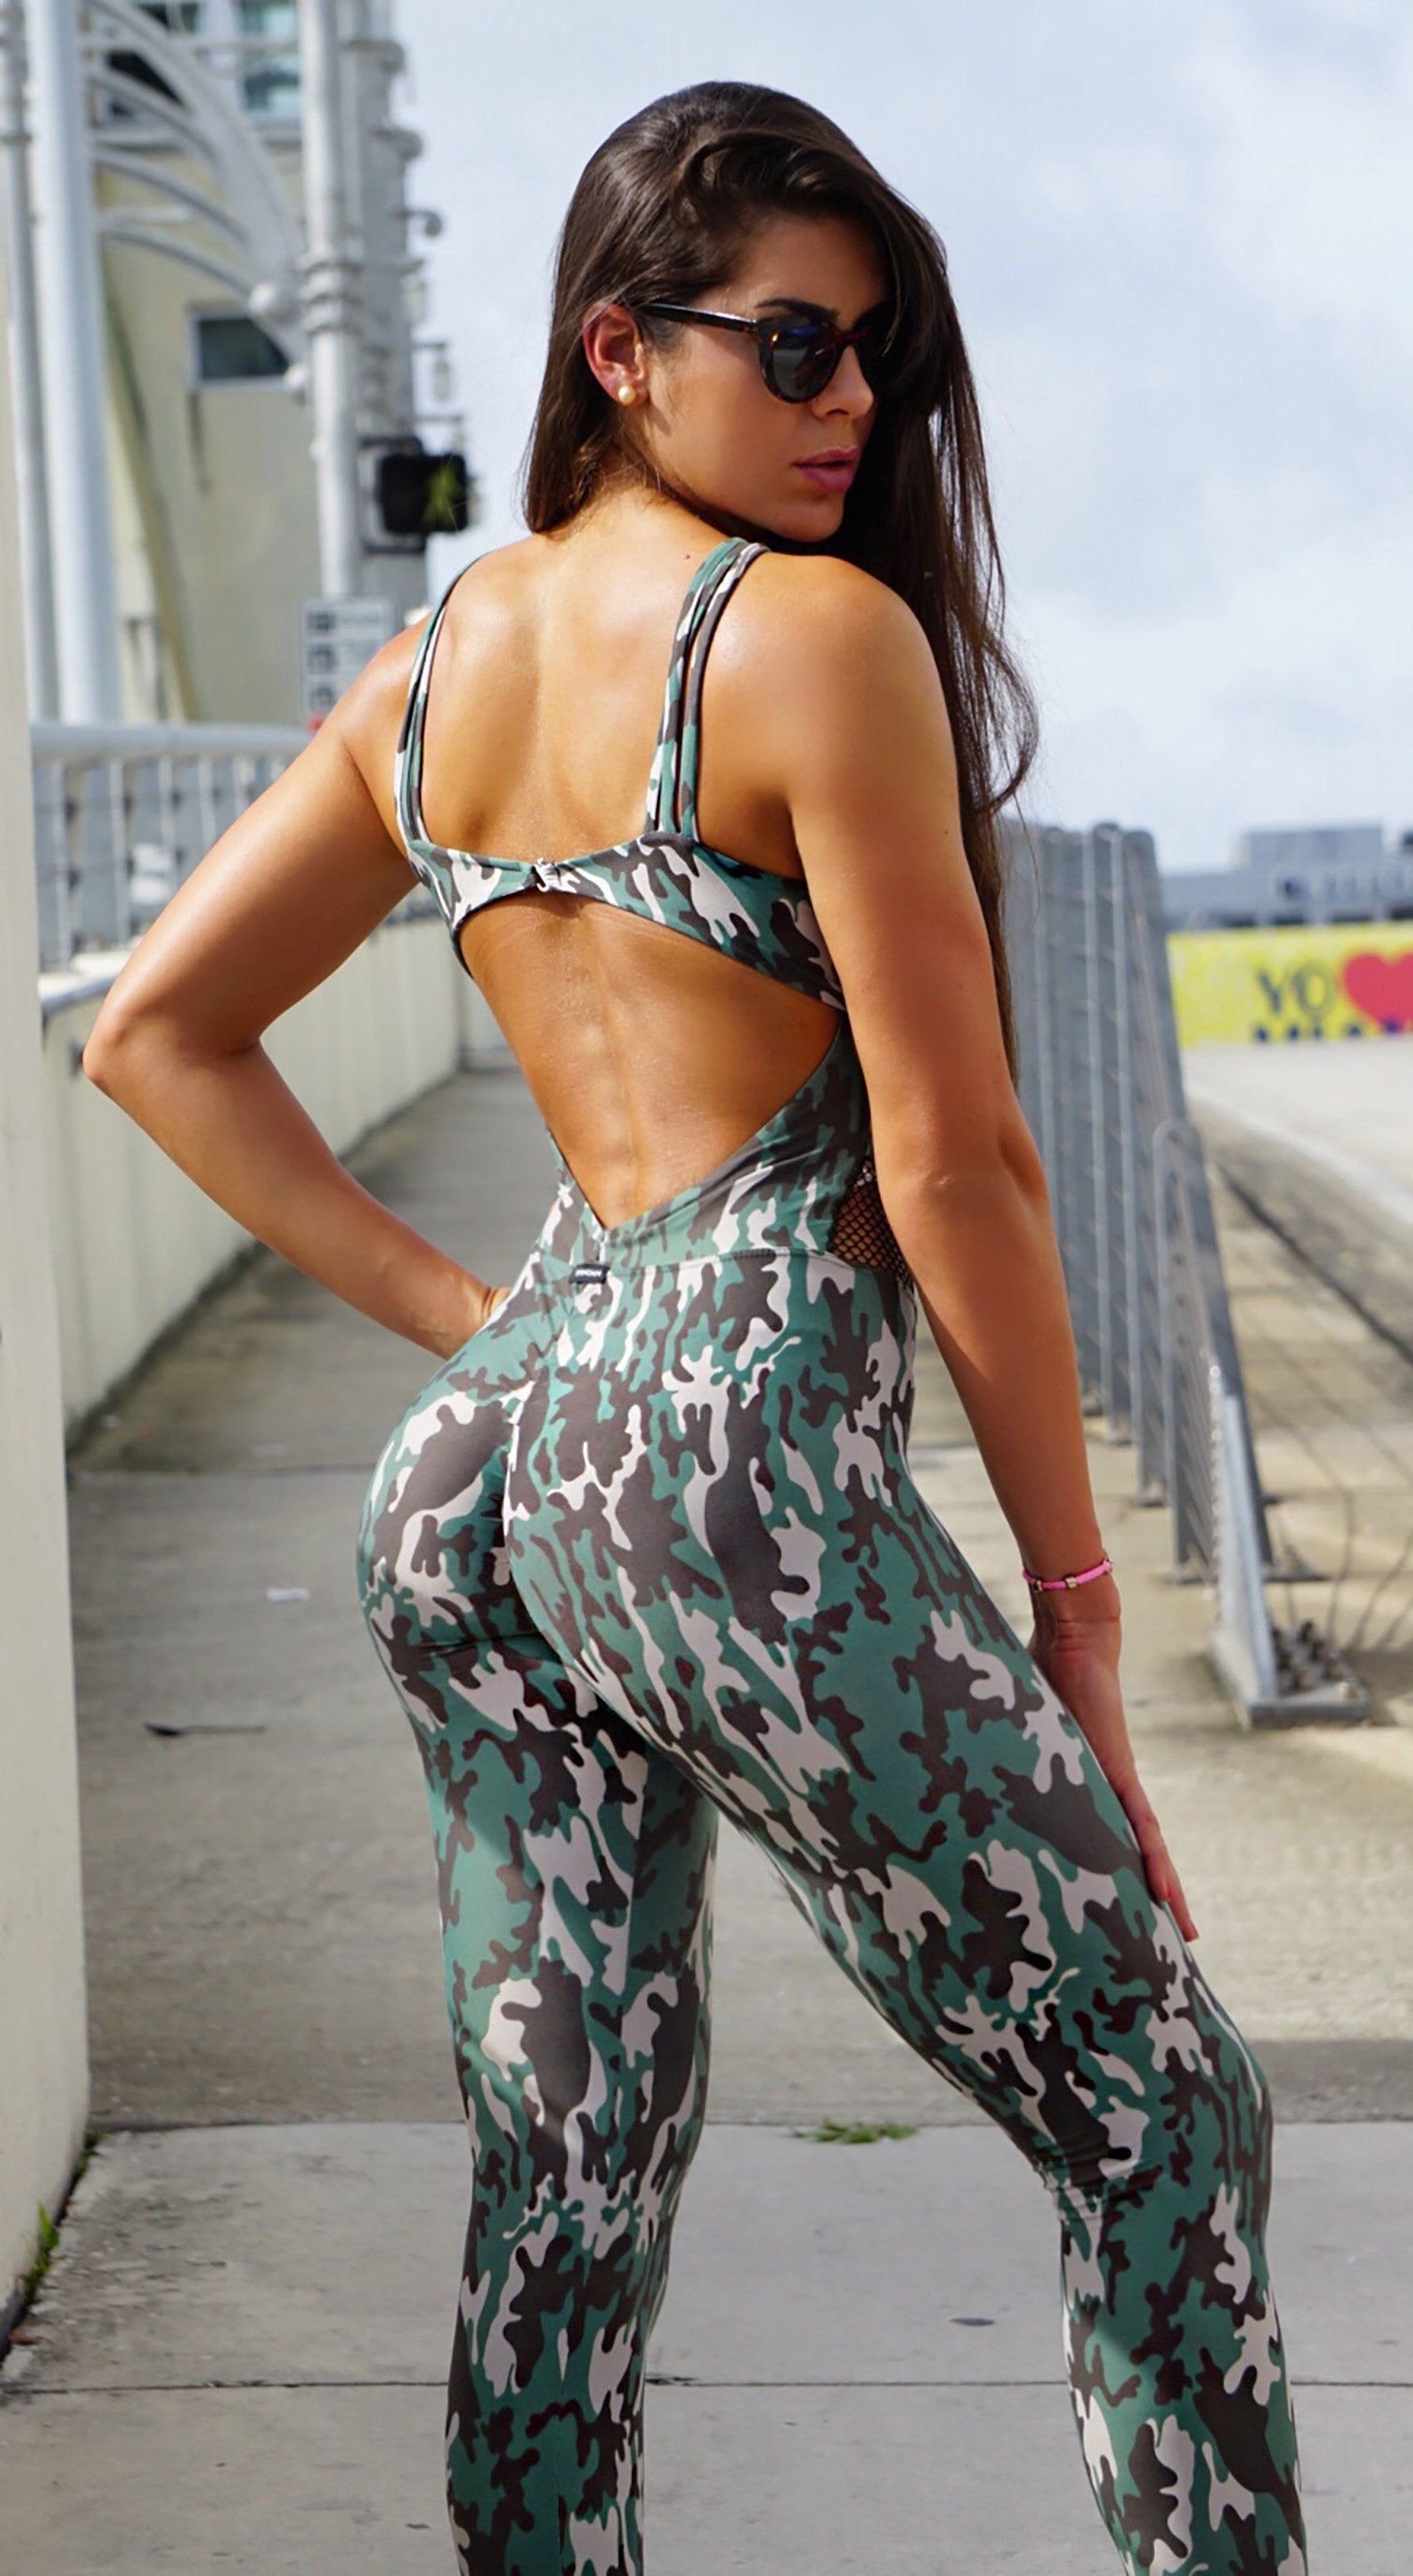 90d5be6031fe Brazilian Workout Jumpsuit - Scrunch Booty Army Green - Top Rio Shop